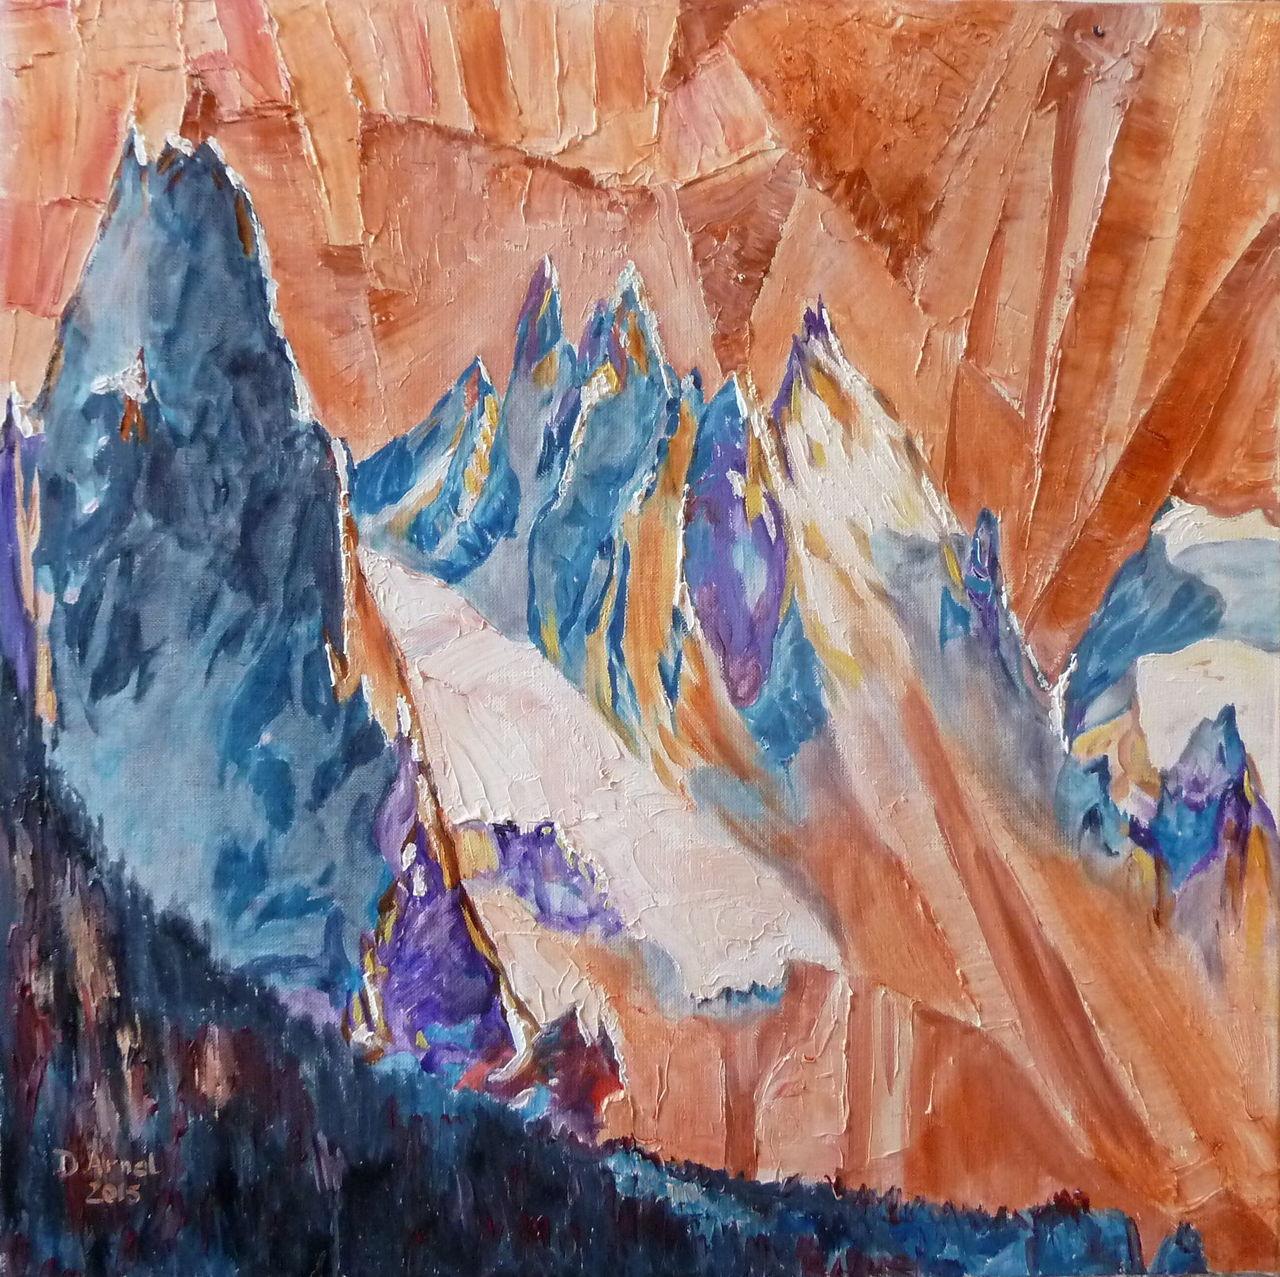 Danielle Arnal Naissance des Alpes